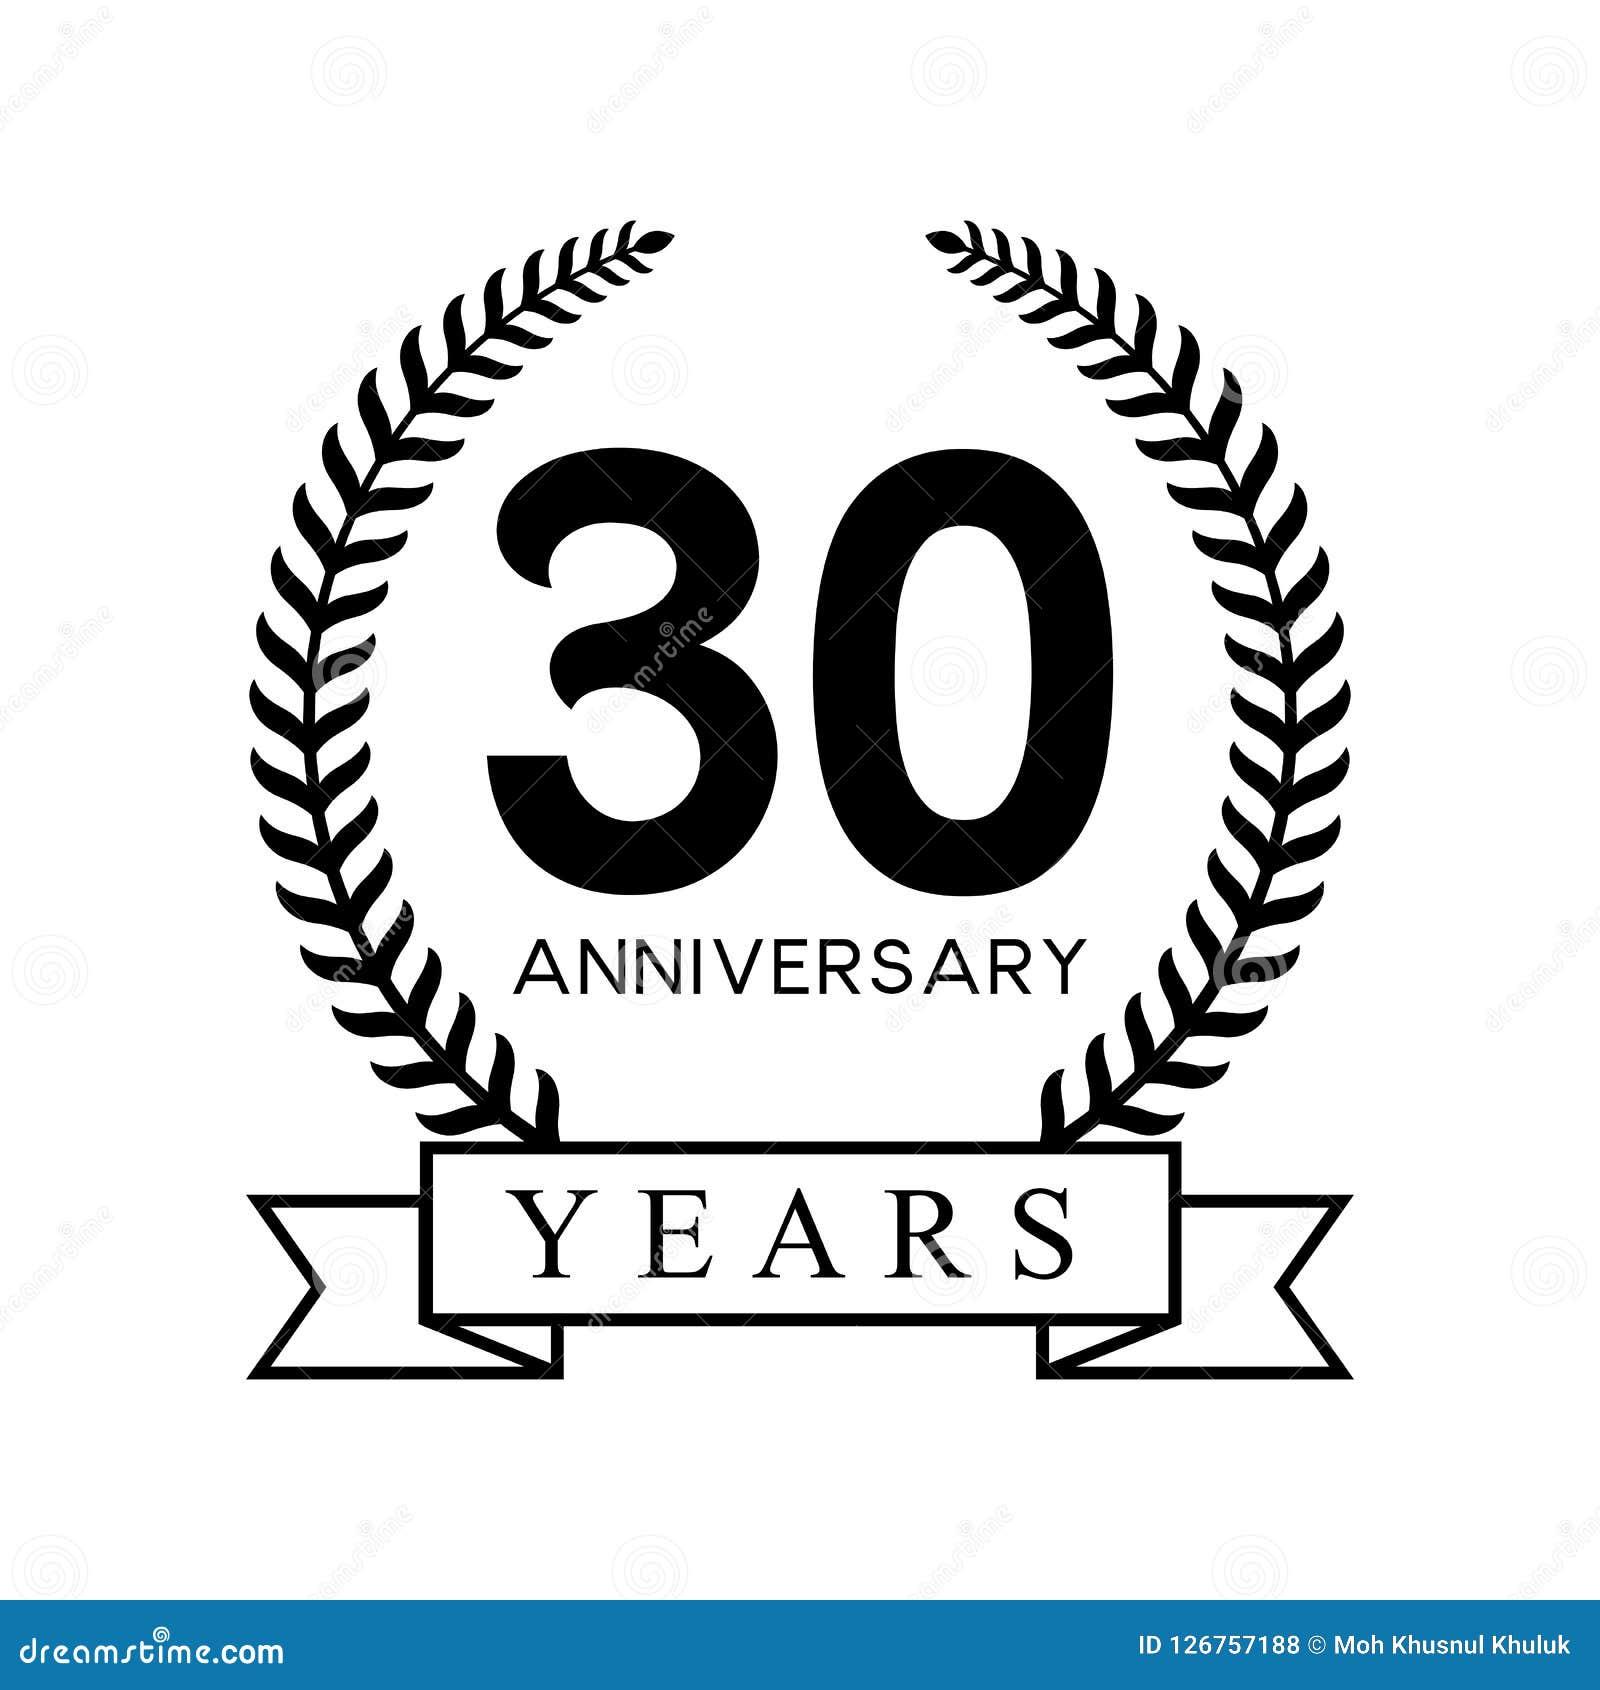 30th Anniversary Years Laurel Wreath Retro Black Color Stock Vector